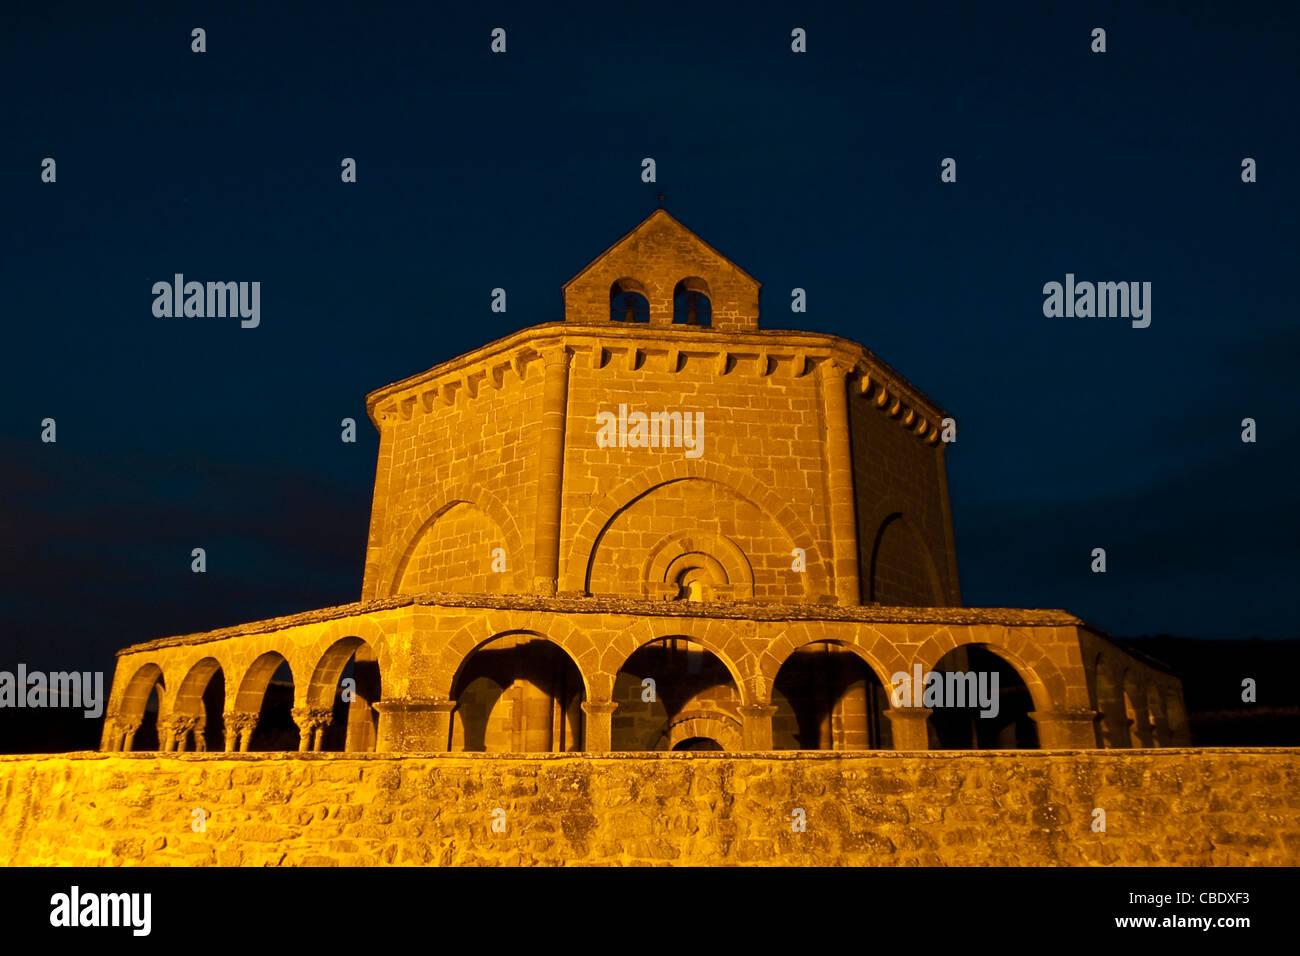 Romanesque church of Santa Maria de Eunate, 12th century, Kingdom of Navarre, Road of Santiago, Spain, Europe - Stock Image